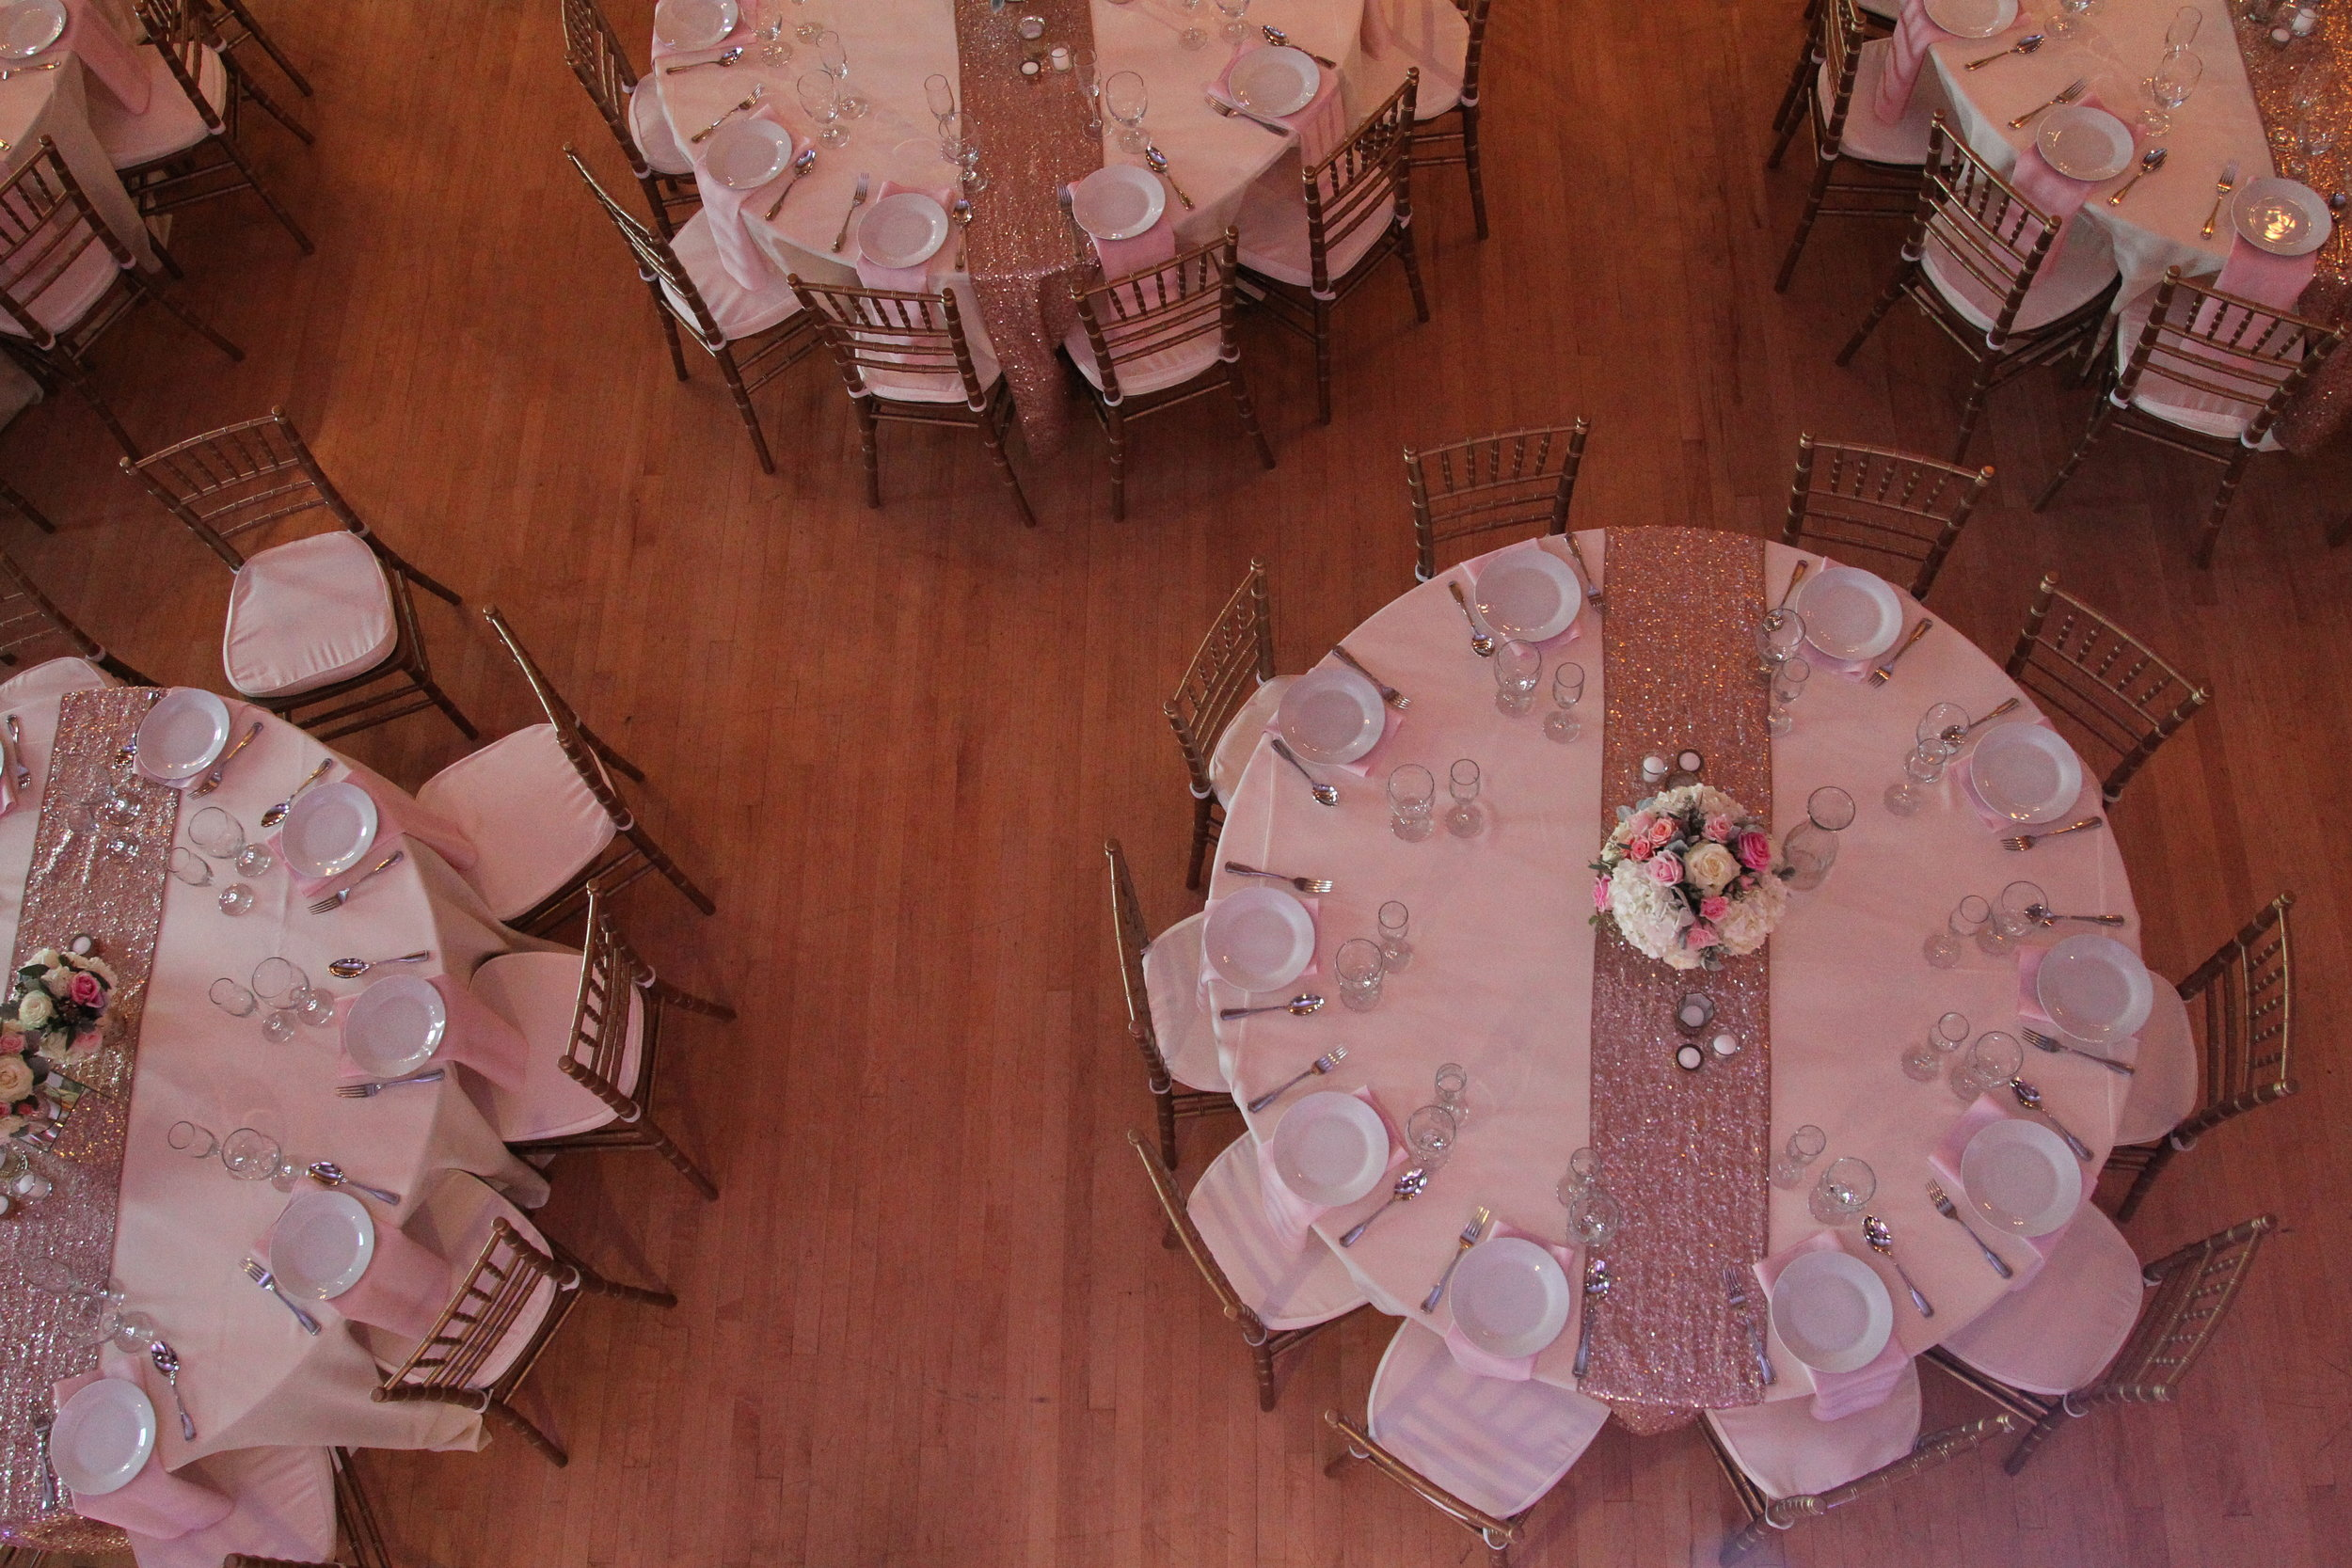 table_setting_blush_centerpiece.JPG